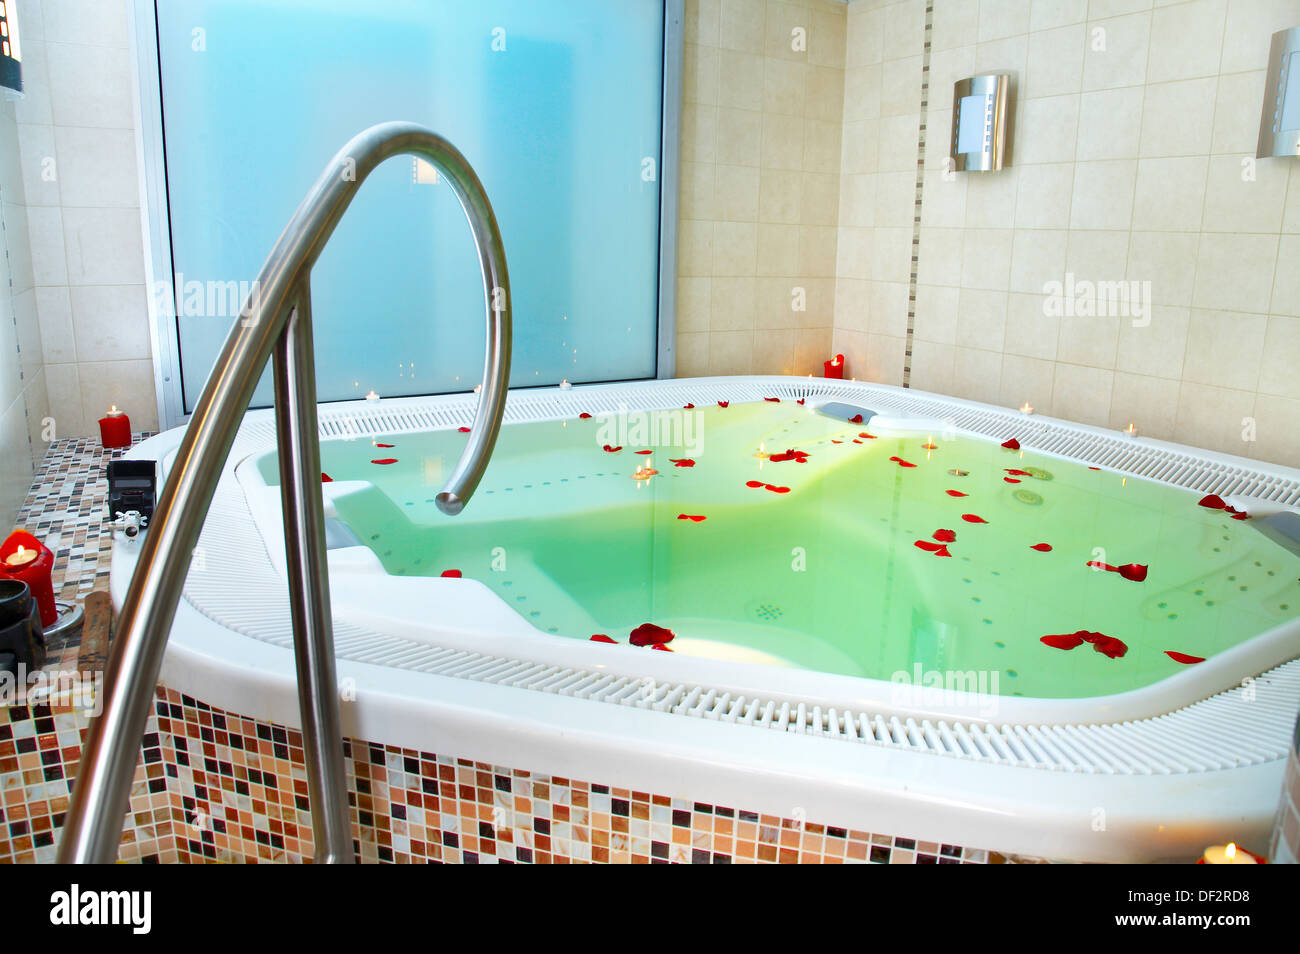 Vasca Da Bagno Jacuzzi Aira : Jacuzzi vasca contento e karina le nuove vasca jacuzzi in luxecast